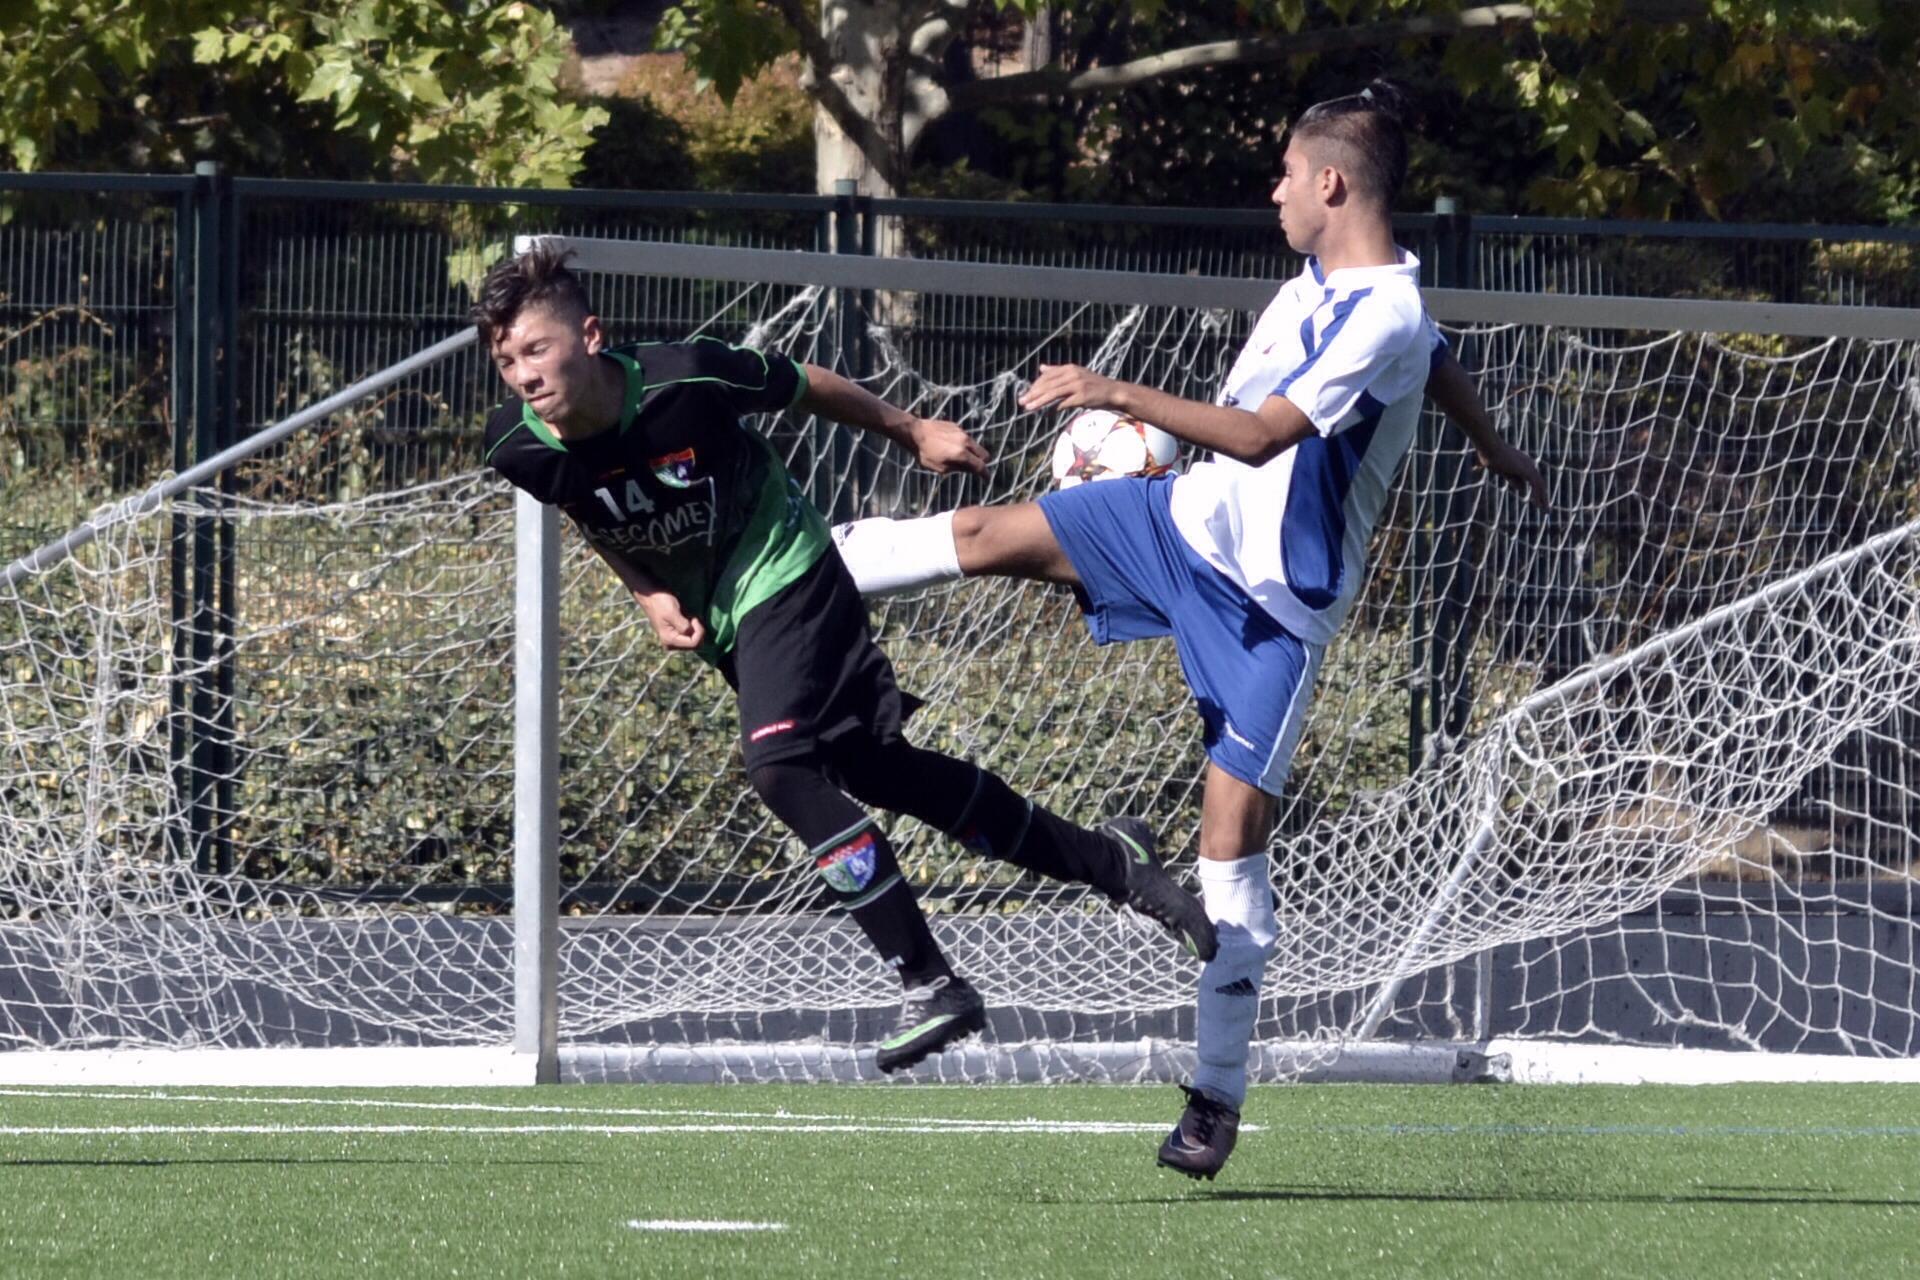 Crónica y fotos del partido EDM Juvenil D 4 – 0 CD Sporting Valdebernardo A